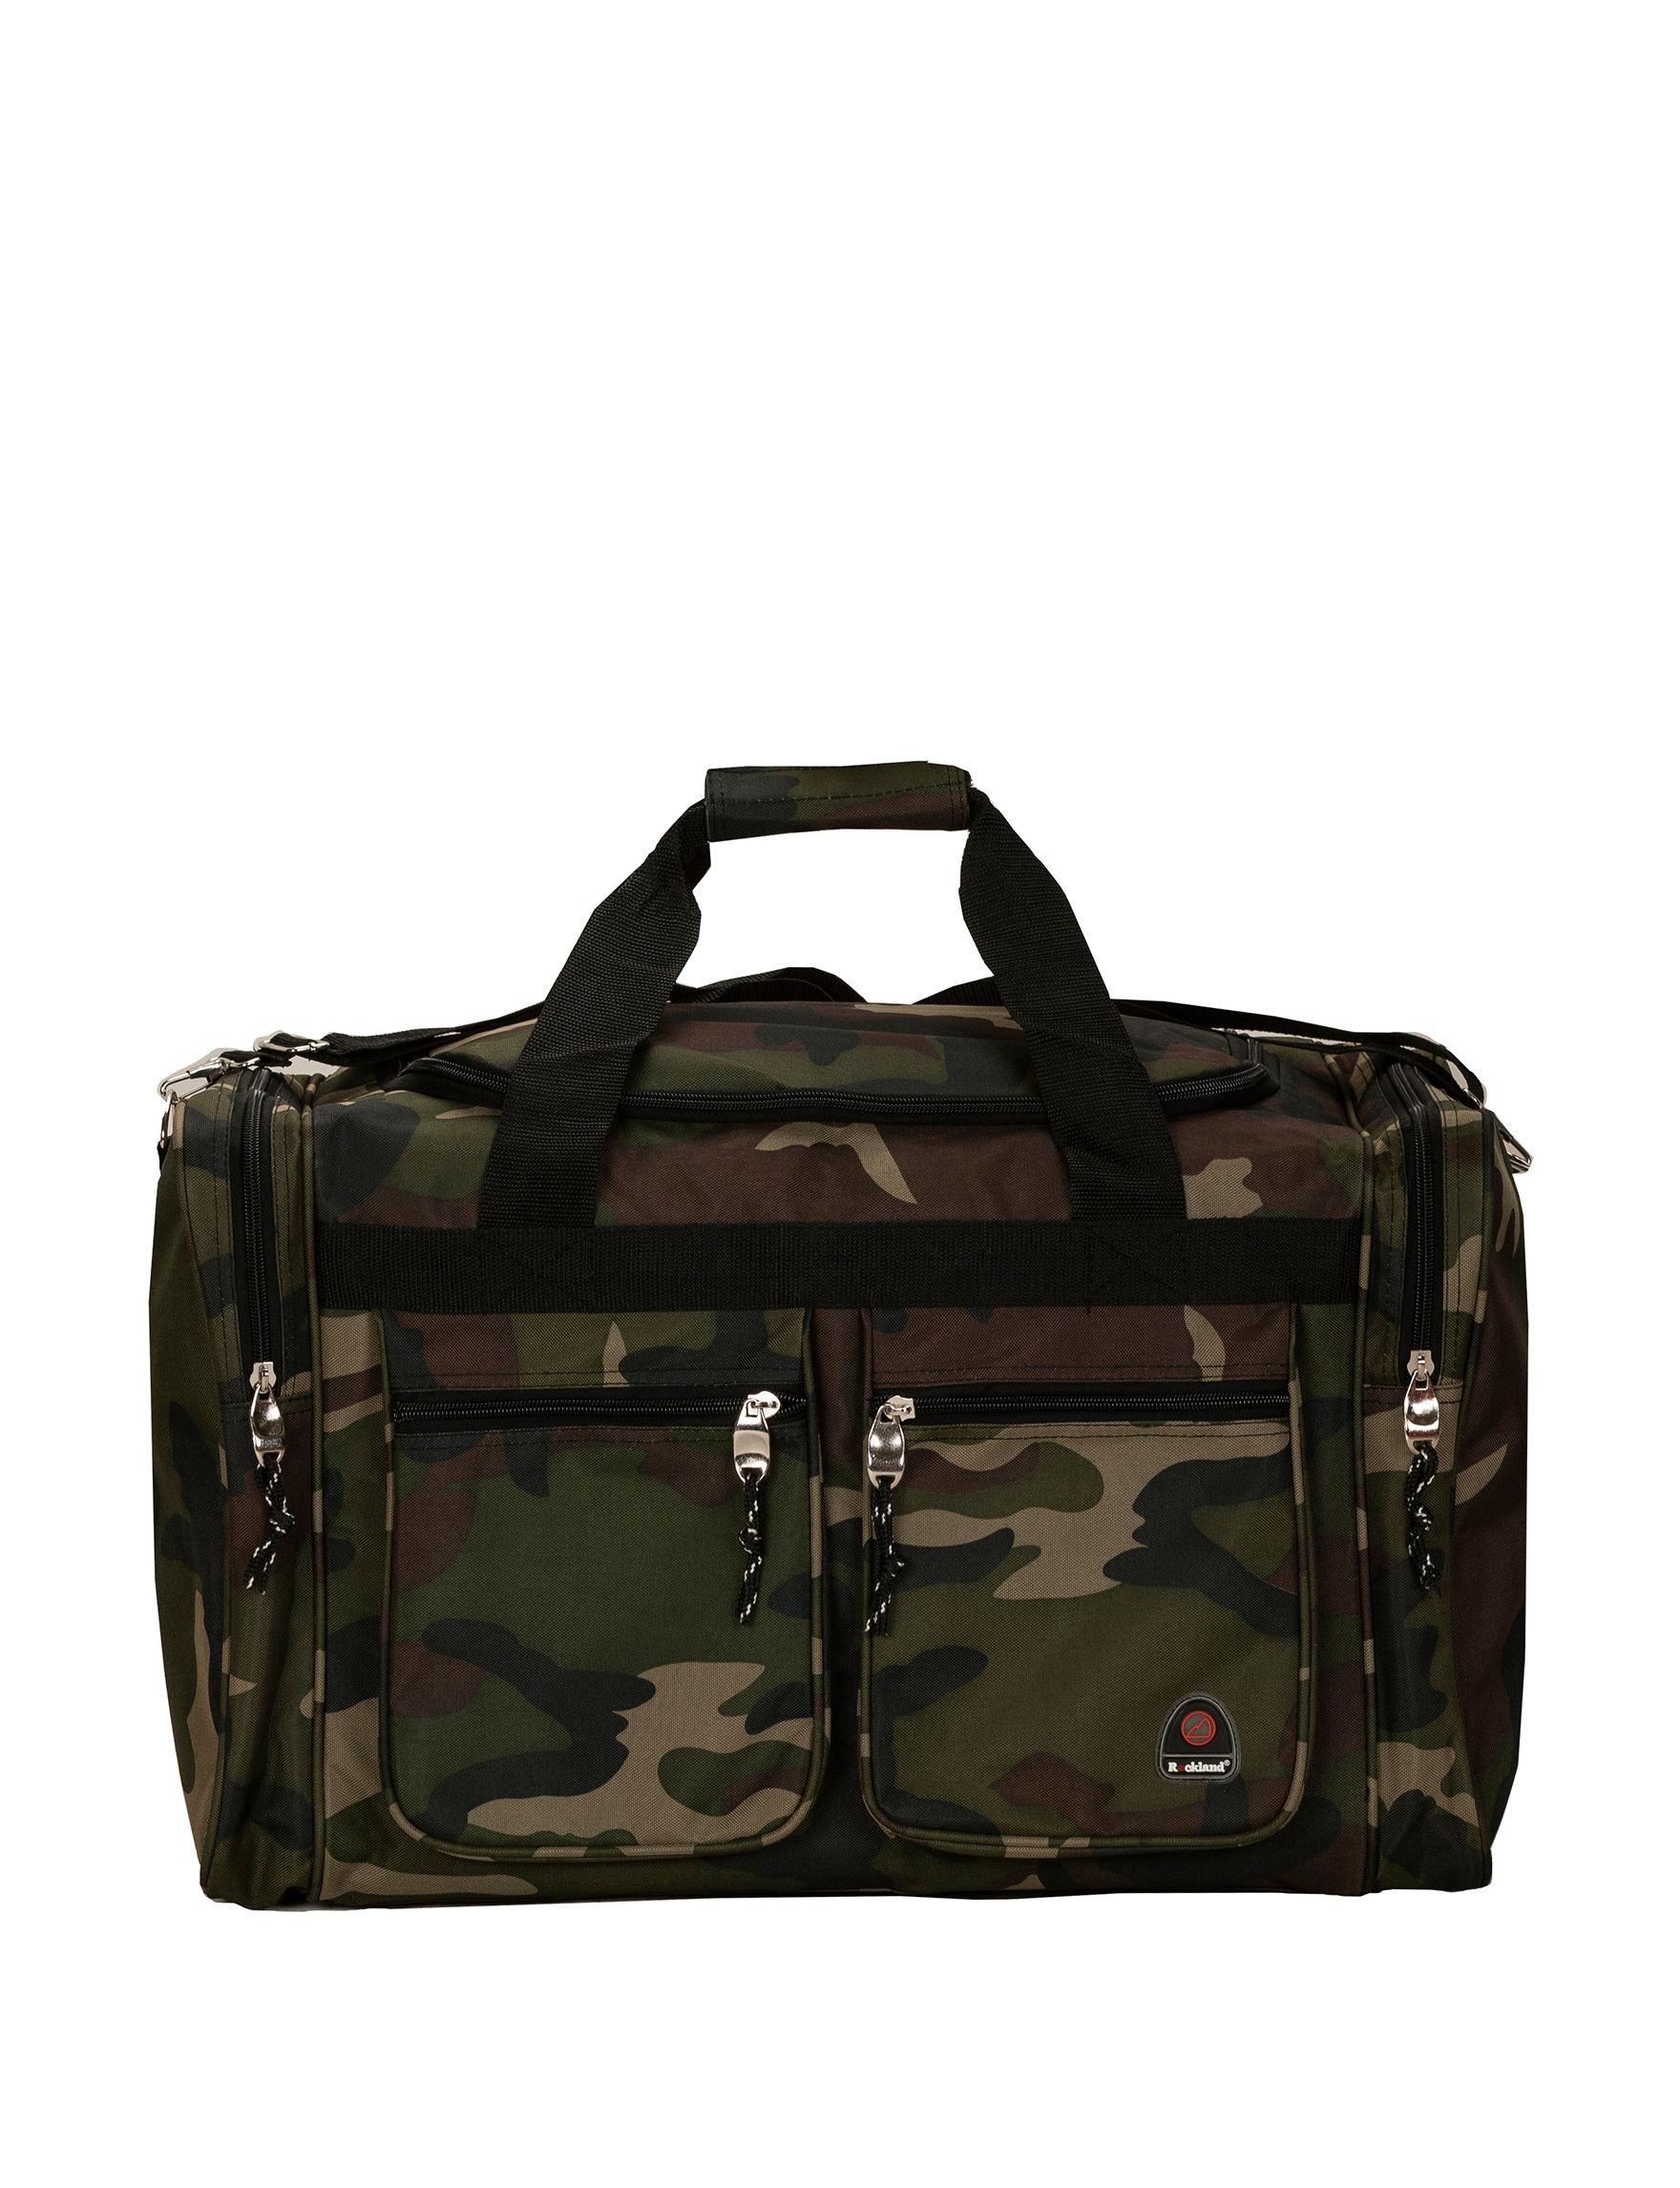 Rockland Camo Weekend Bags